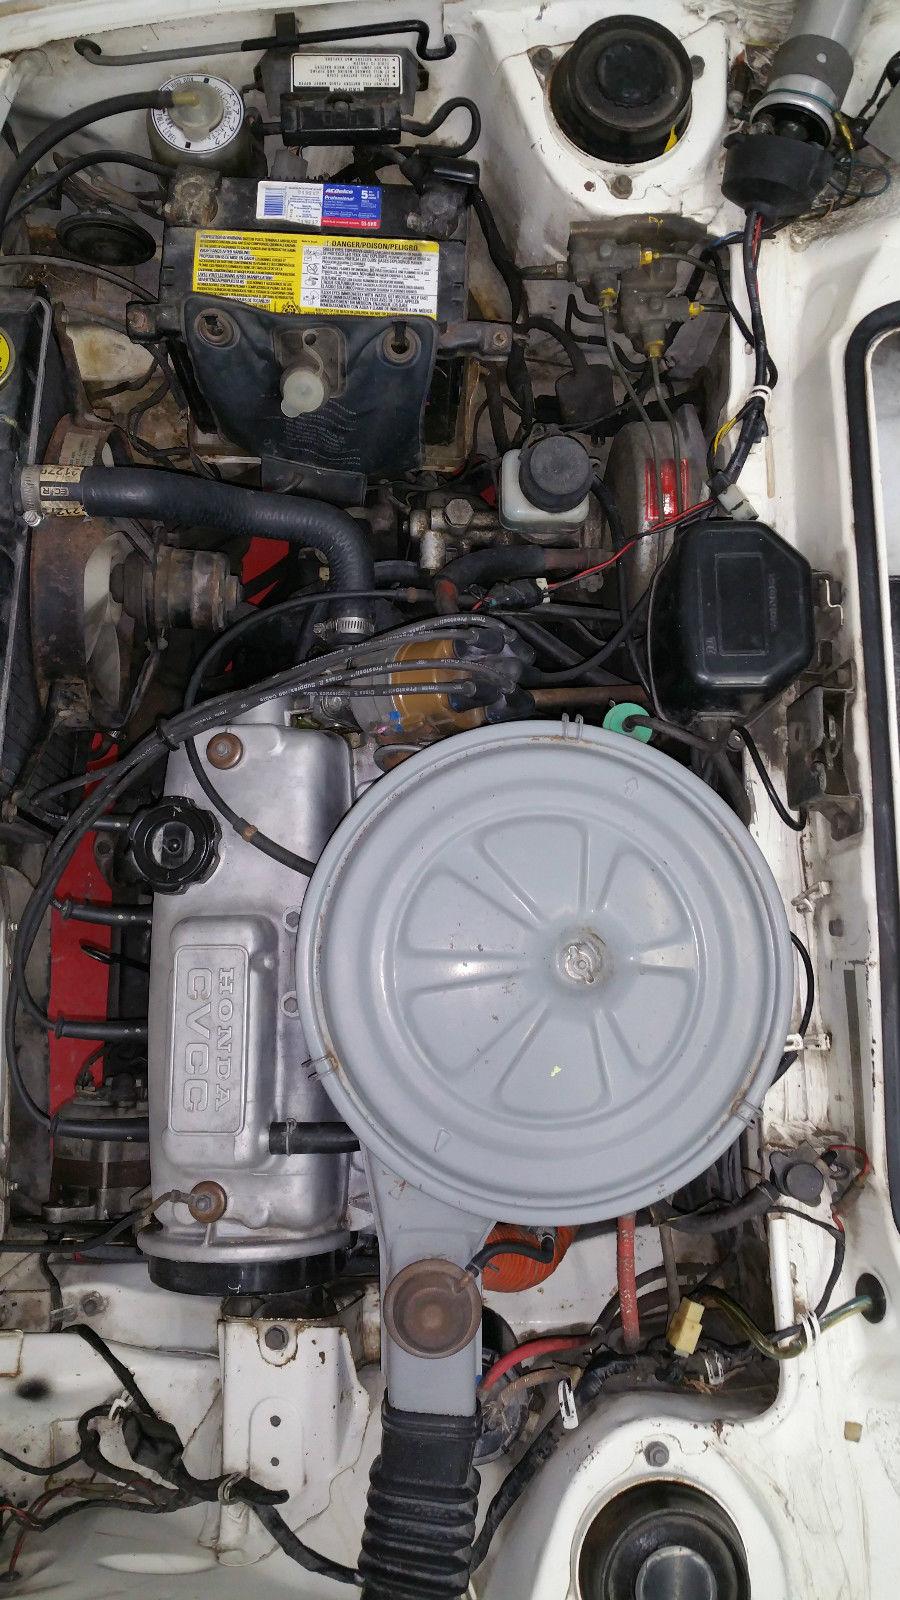 77 Honda Civic Cvcc For Sale In Santa Ana California United States 1970 1977